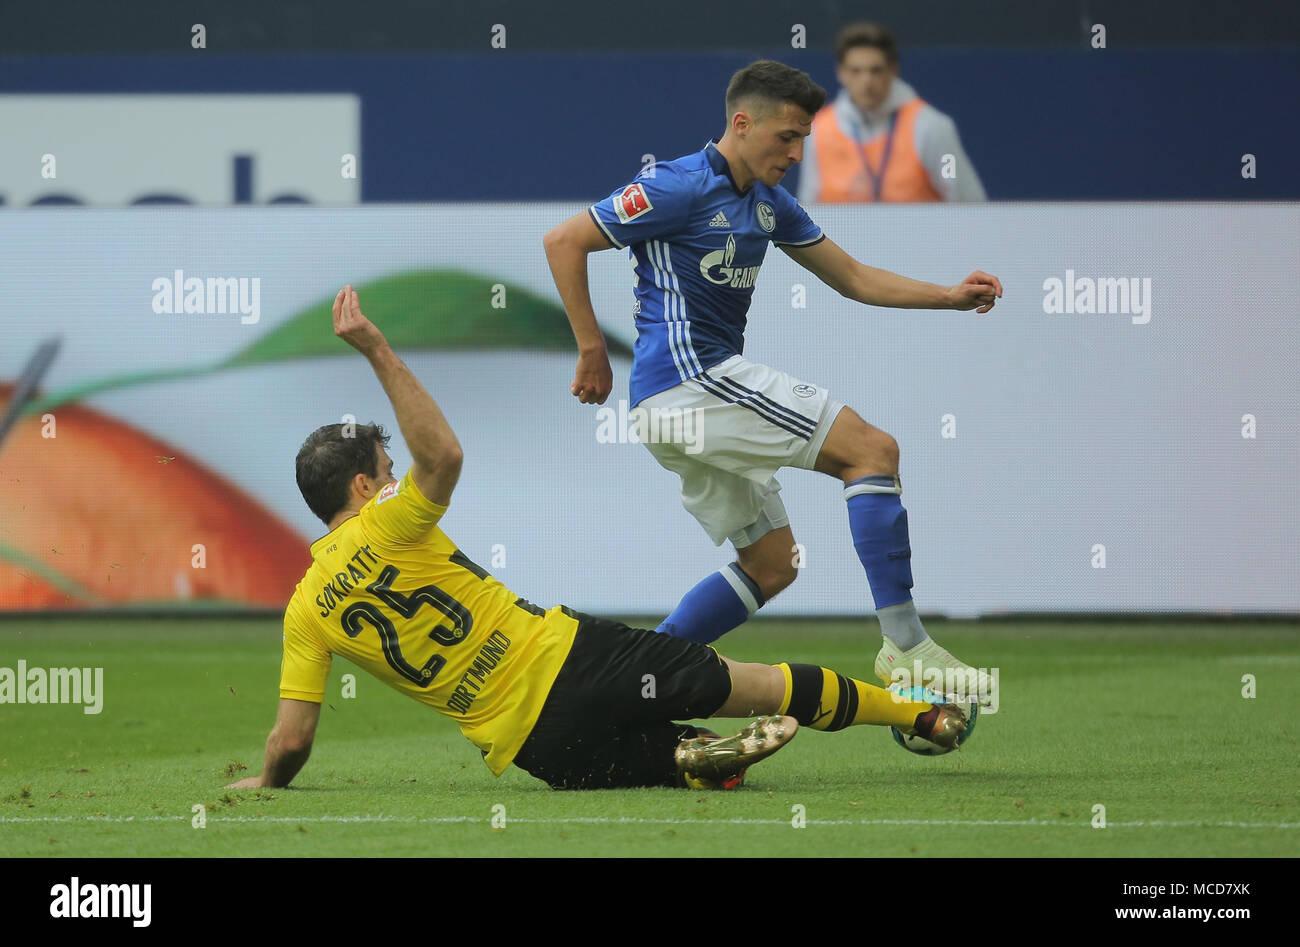 Gelsenkirchen, Germany April 15 2018, Bundesliga matchday 30, FC Schalke 04 vs BV Borussia Dortmund: Sokratis (Dortmund) and Alessandro Andre Schoepf (Schalke) in competition.                 Credit: Juergen Schwarz/Alamy Live News Stock Photo